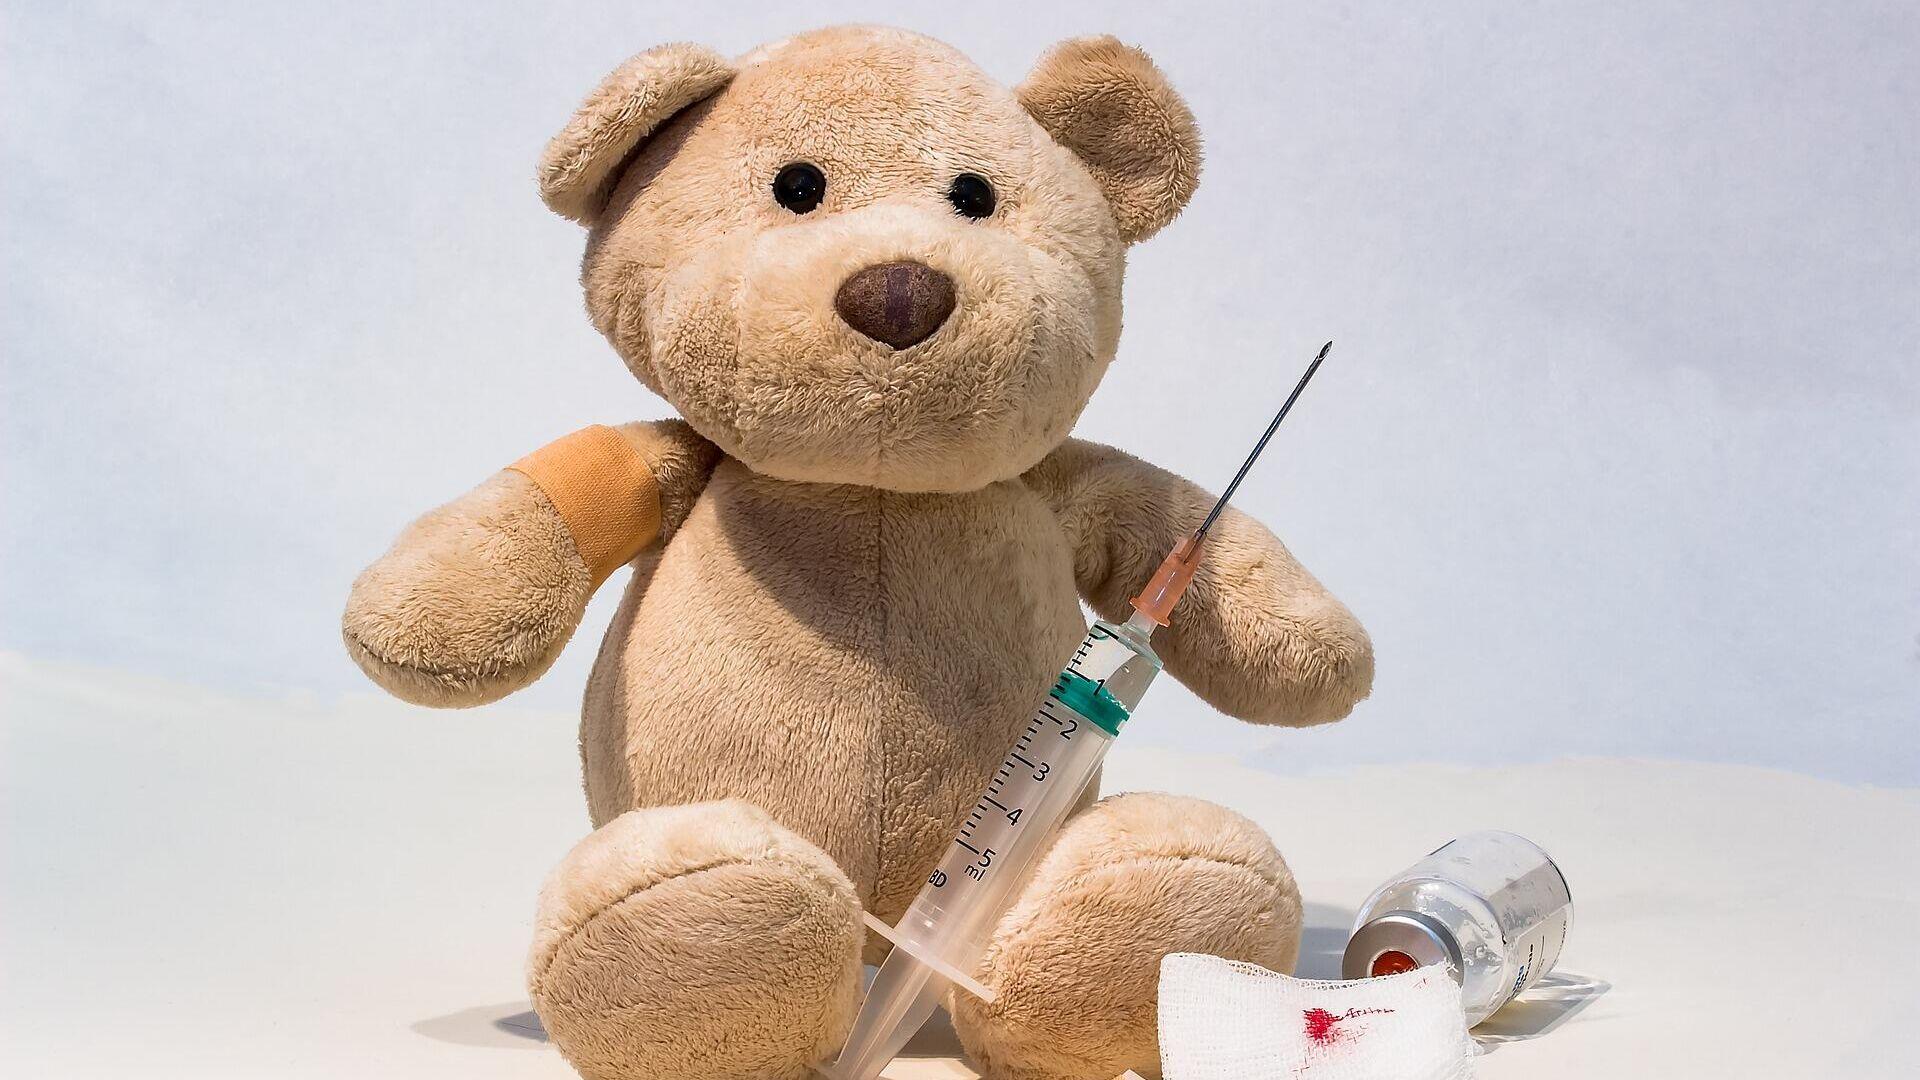 Impfung (Symbolbild) - SNA, 1920, 15.09.2021